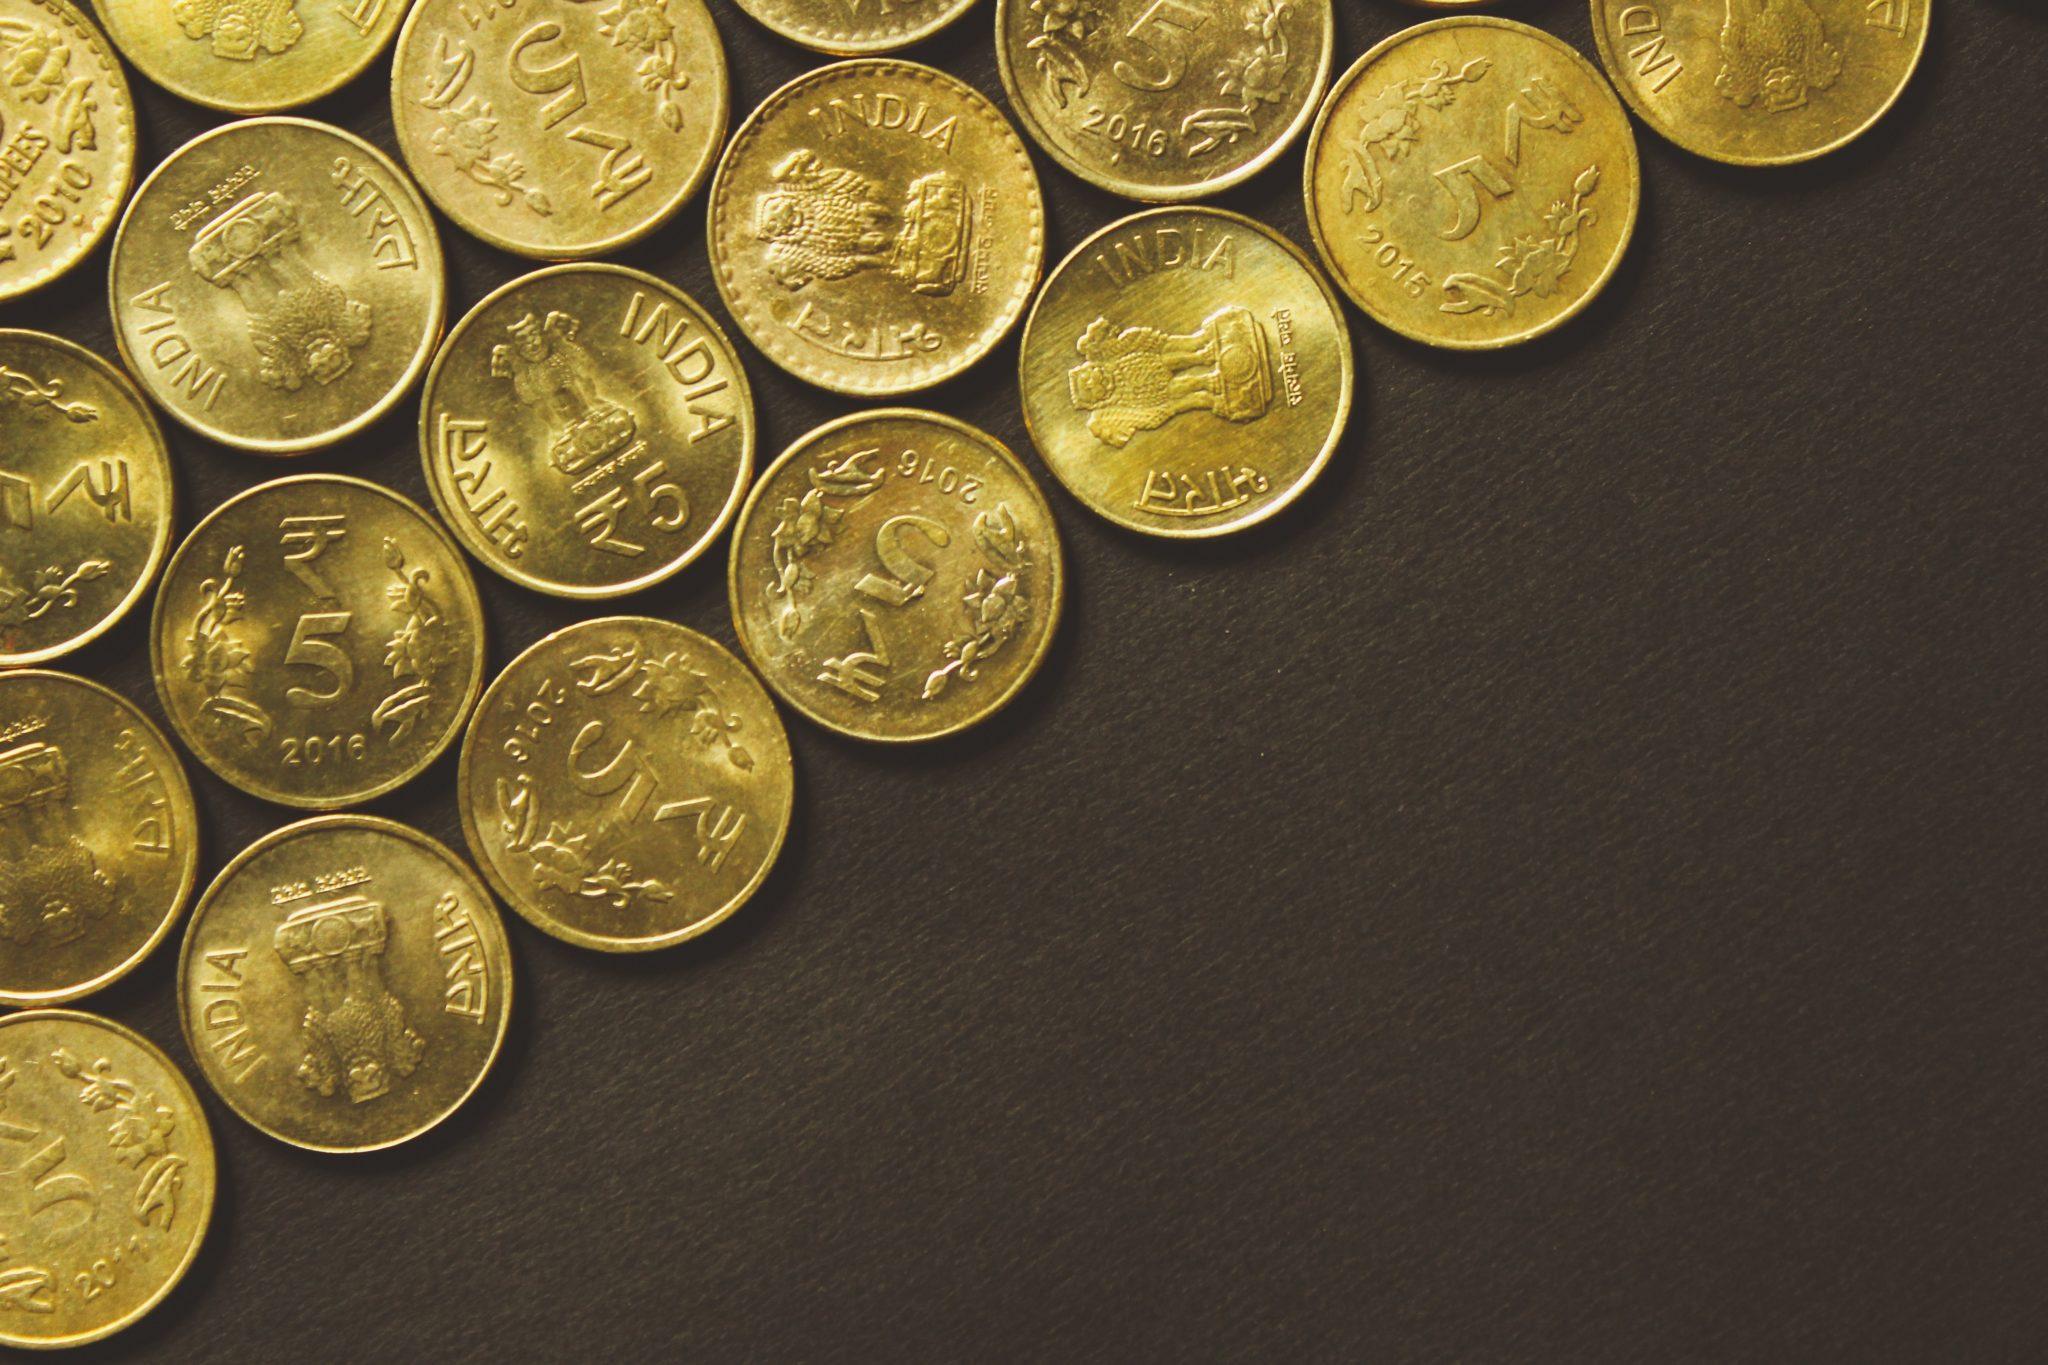 Münzen in regelmäßigem Muster